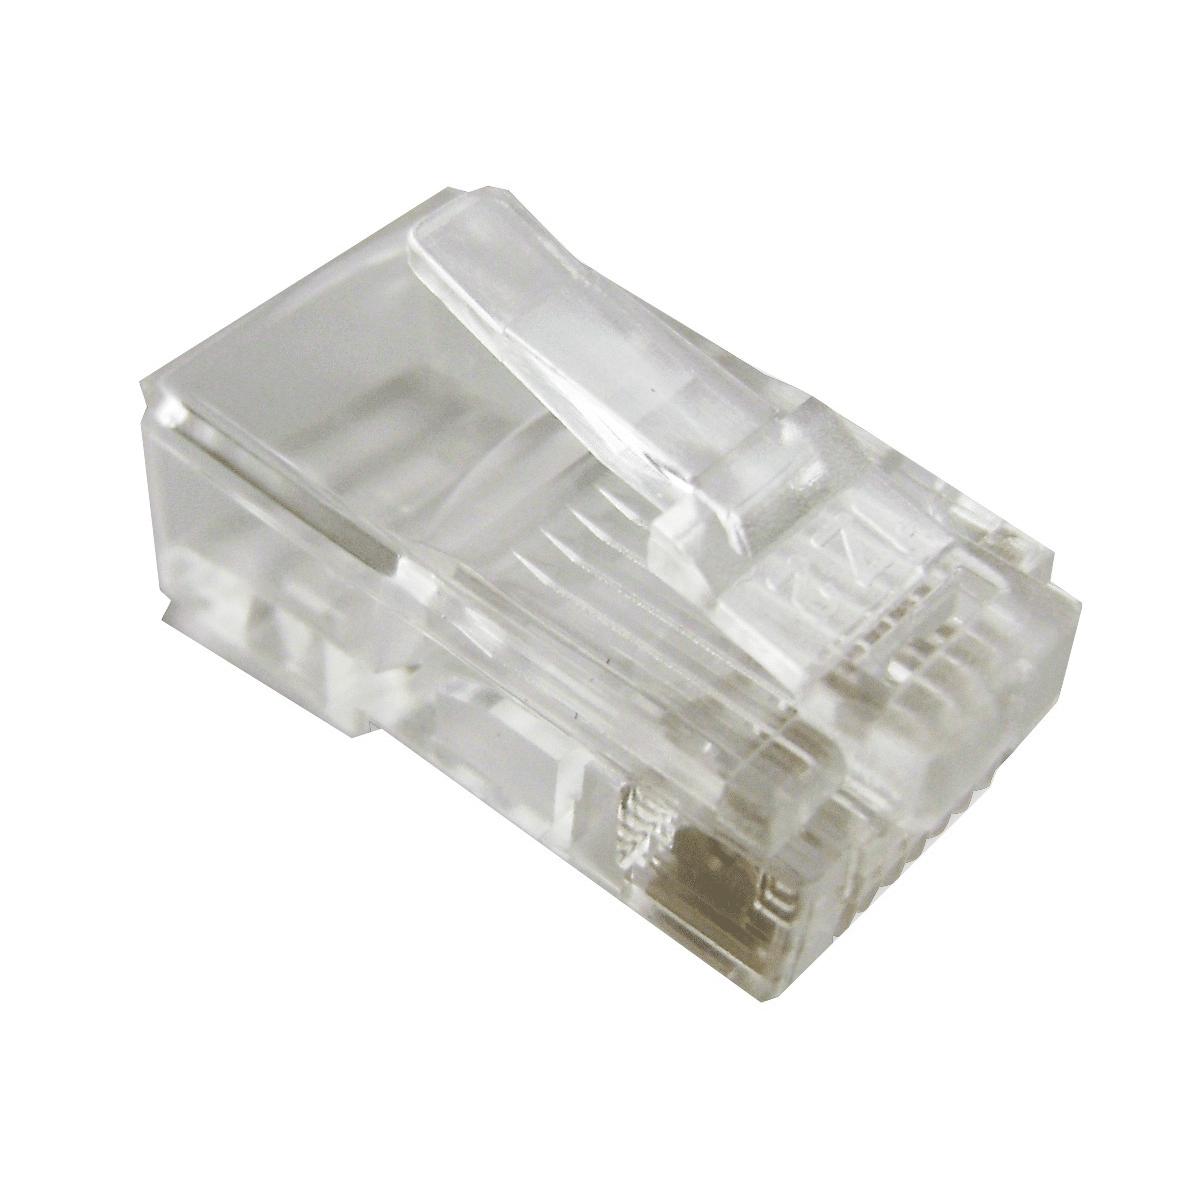 Cat6 Rj45 Utp Modular Plugs Bag Of 100 Solid Hcc Wiring